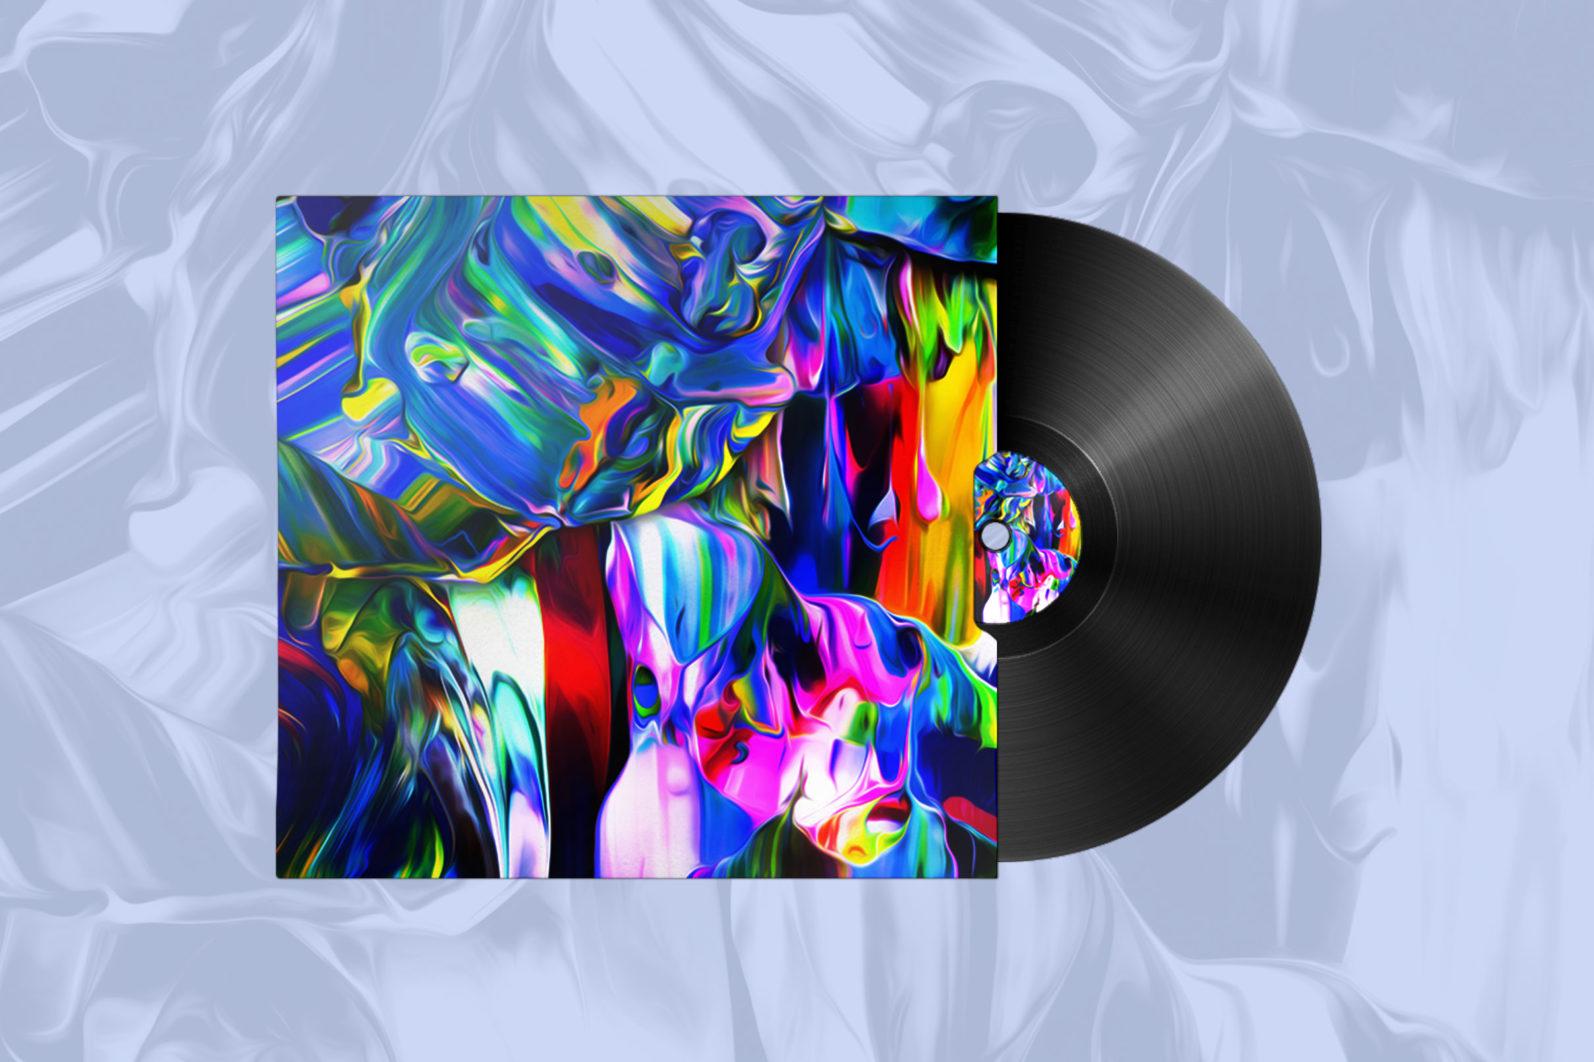 Flow, Vol. 2: 100 Smooth Paint Textures - Flow Vol 2 Preview 02 -